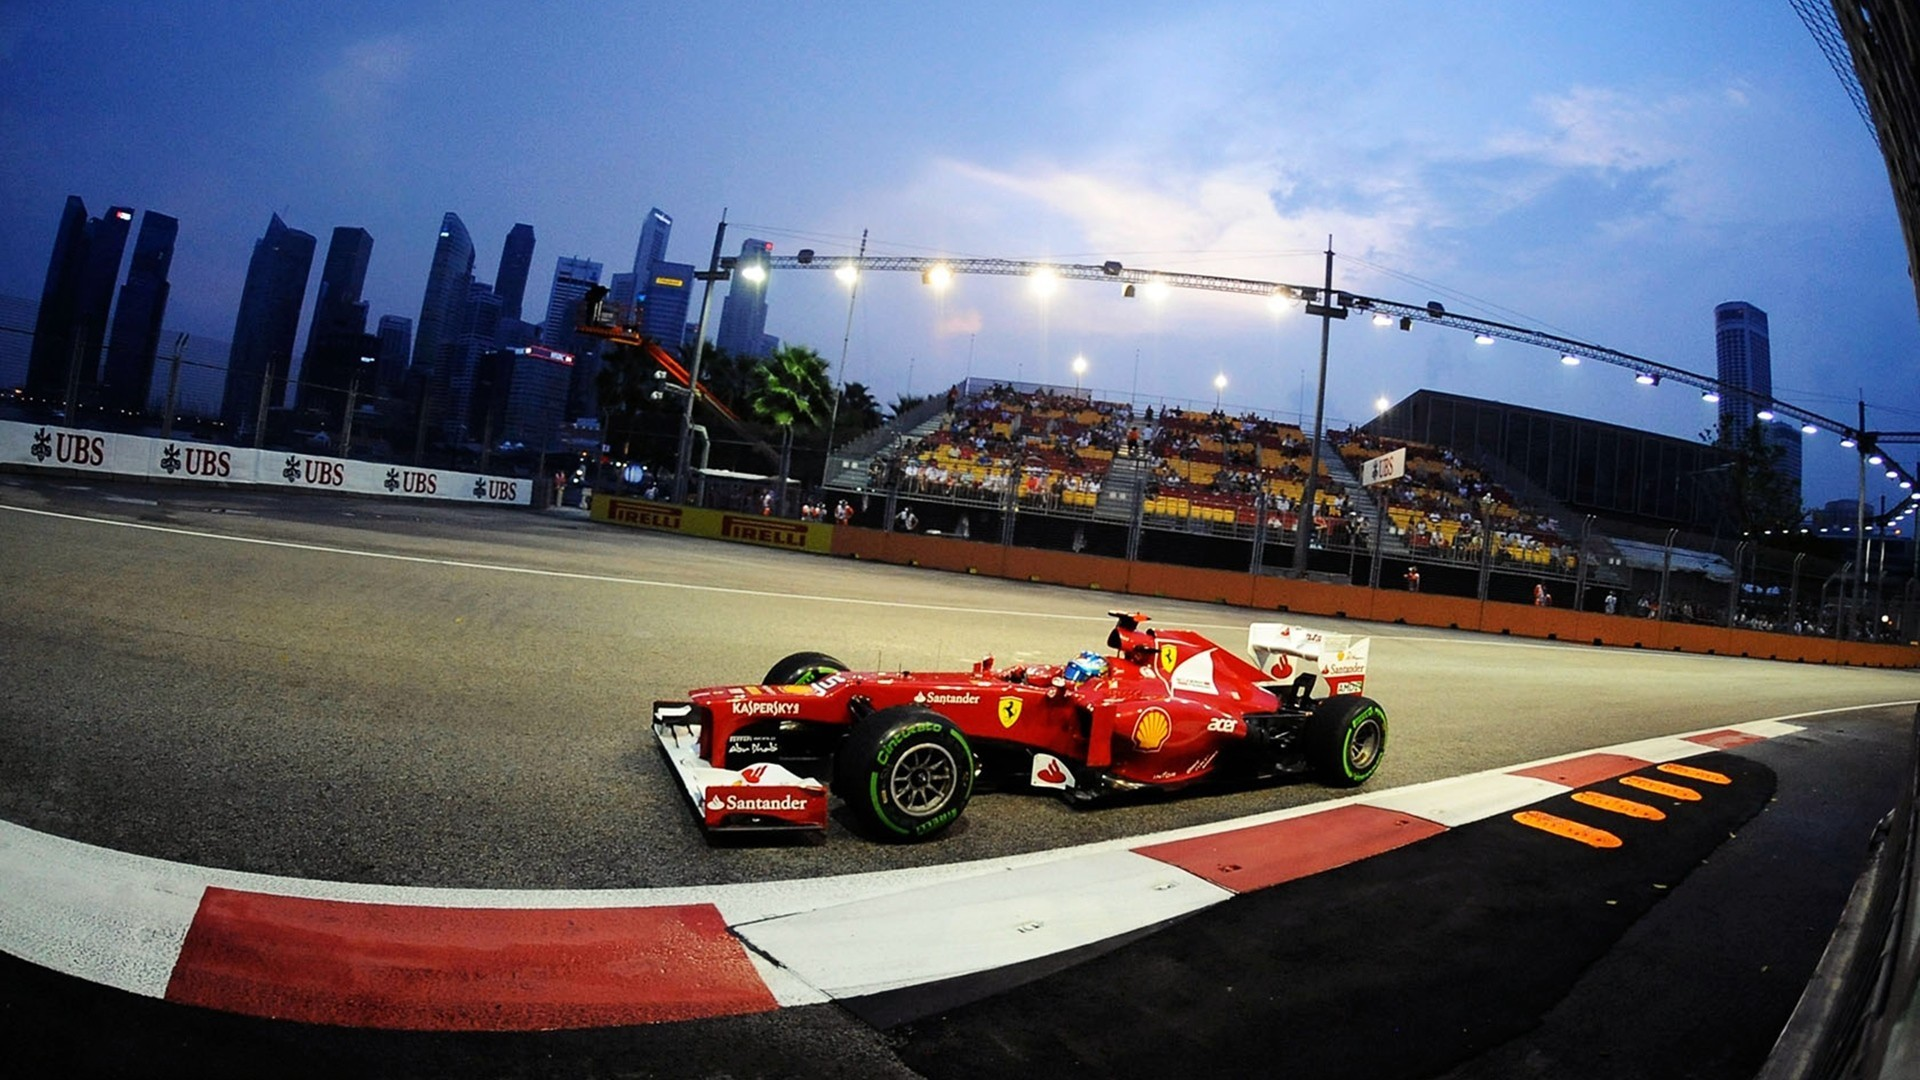 Ferrari, Fernando Alonso, Formula 1 Wallpapers HD / Desktop and Mobile  Backgrounds